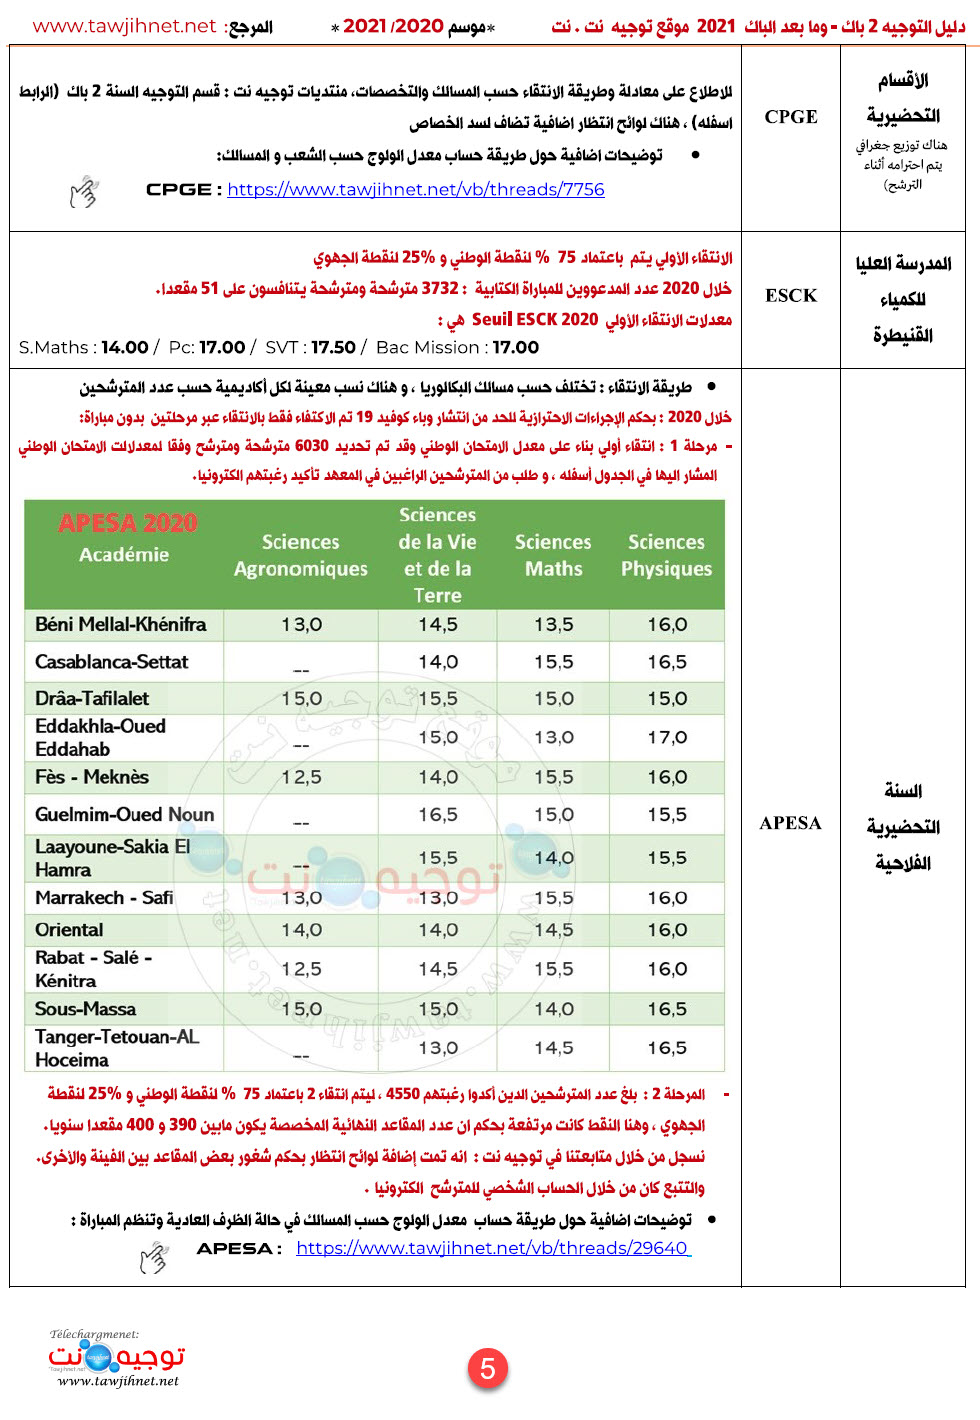 seuils-preselection-ecoles-instituts-maroc-2021_Page_5.jpg